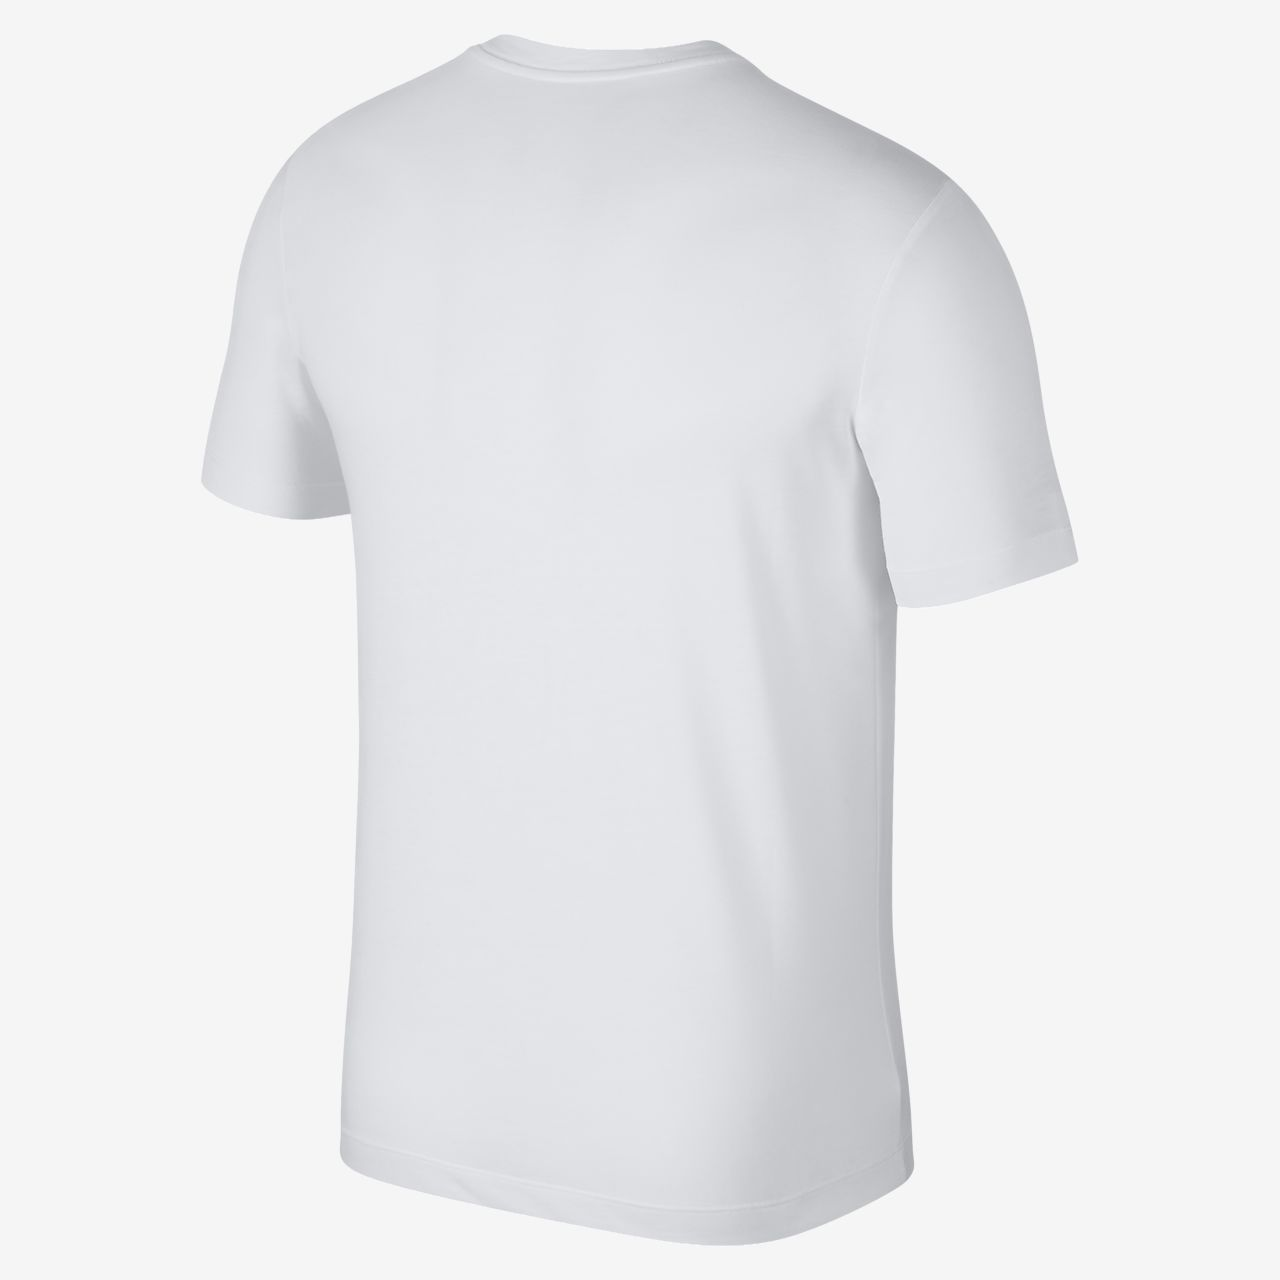 041547f3 Nike Mens Tennis T Shirt - DREAMWORKS